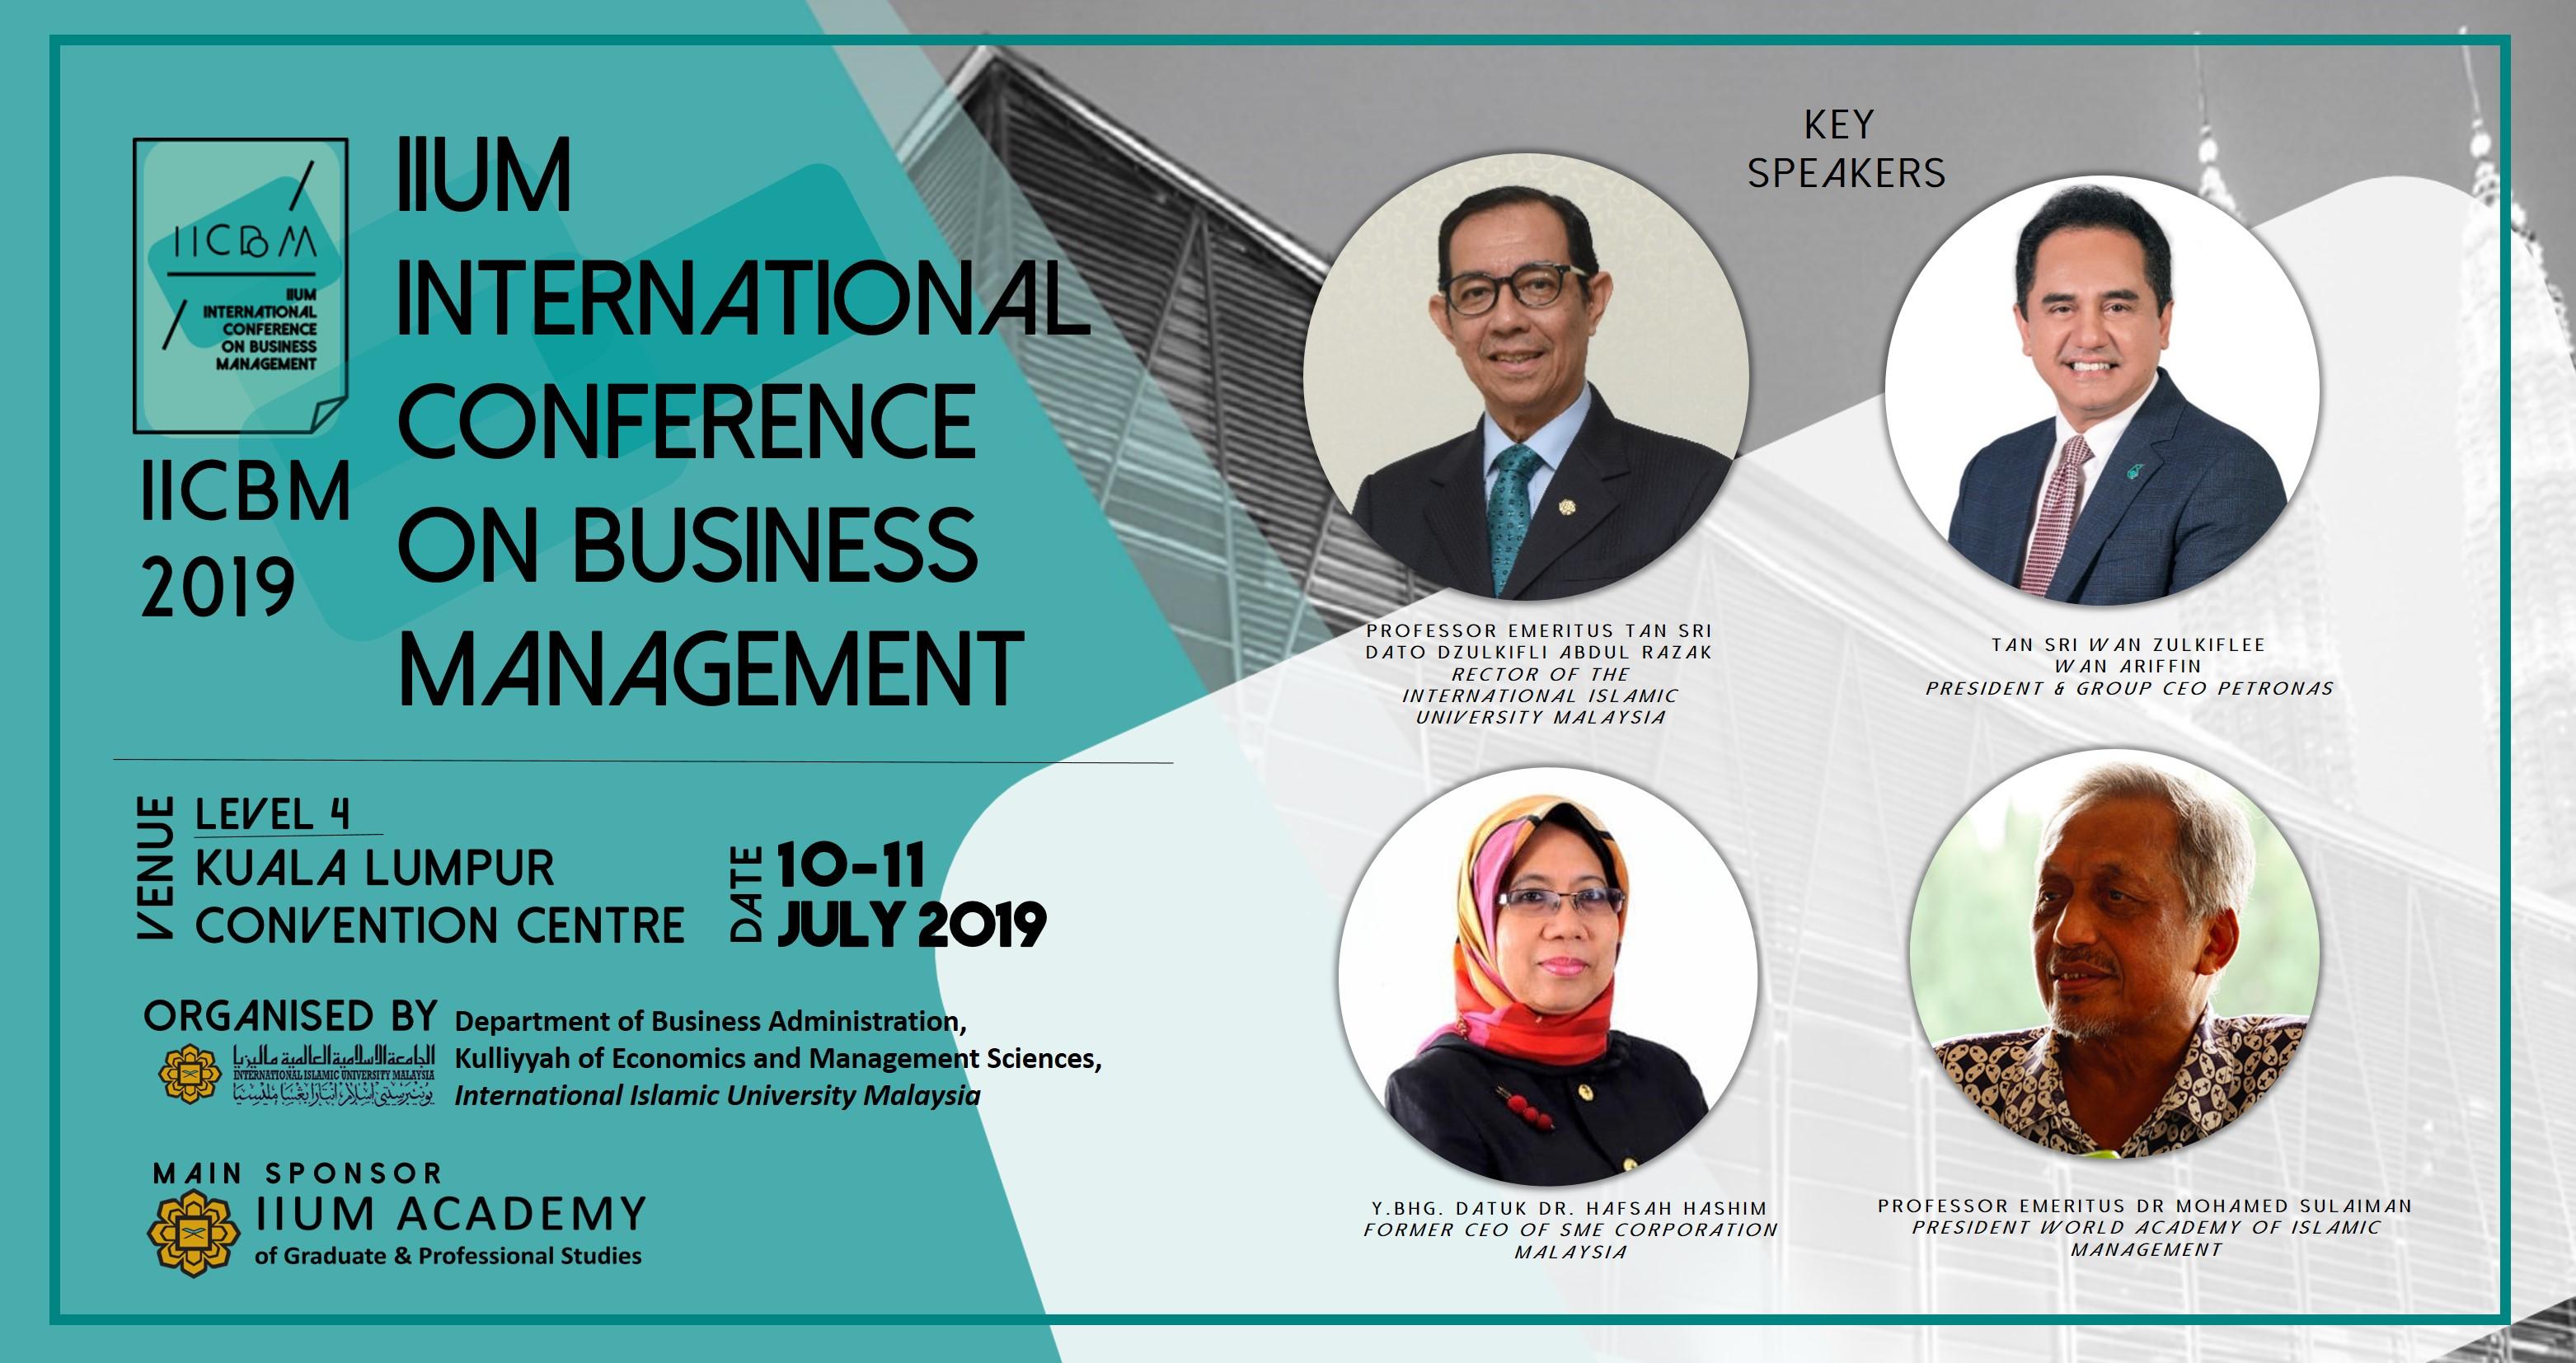 IIUM International Conference on Business Management